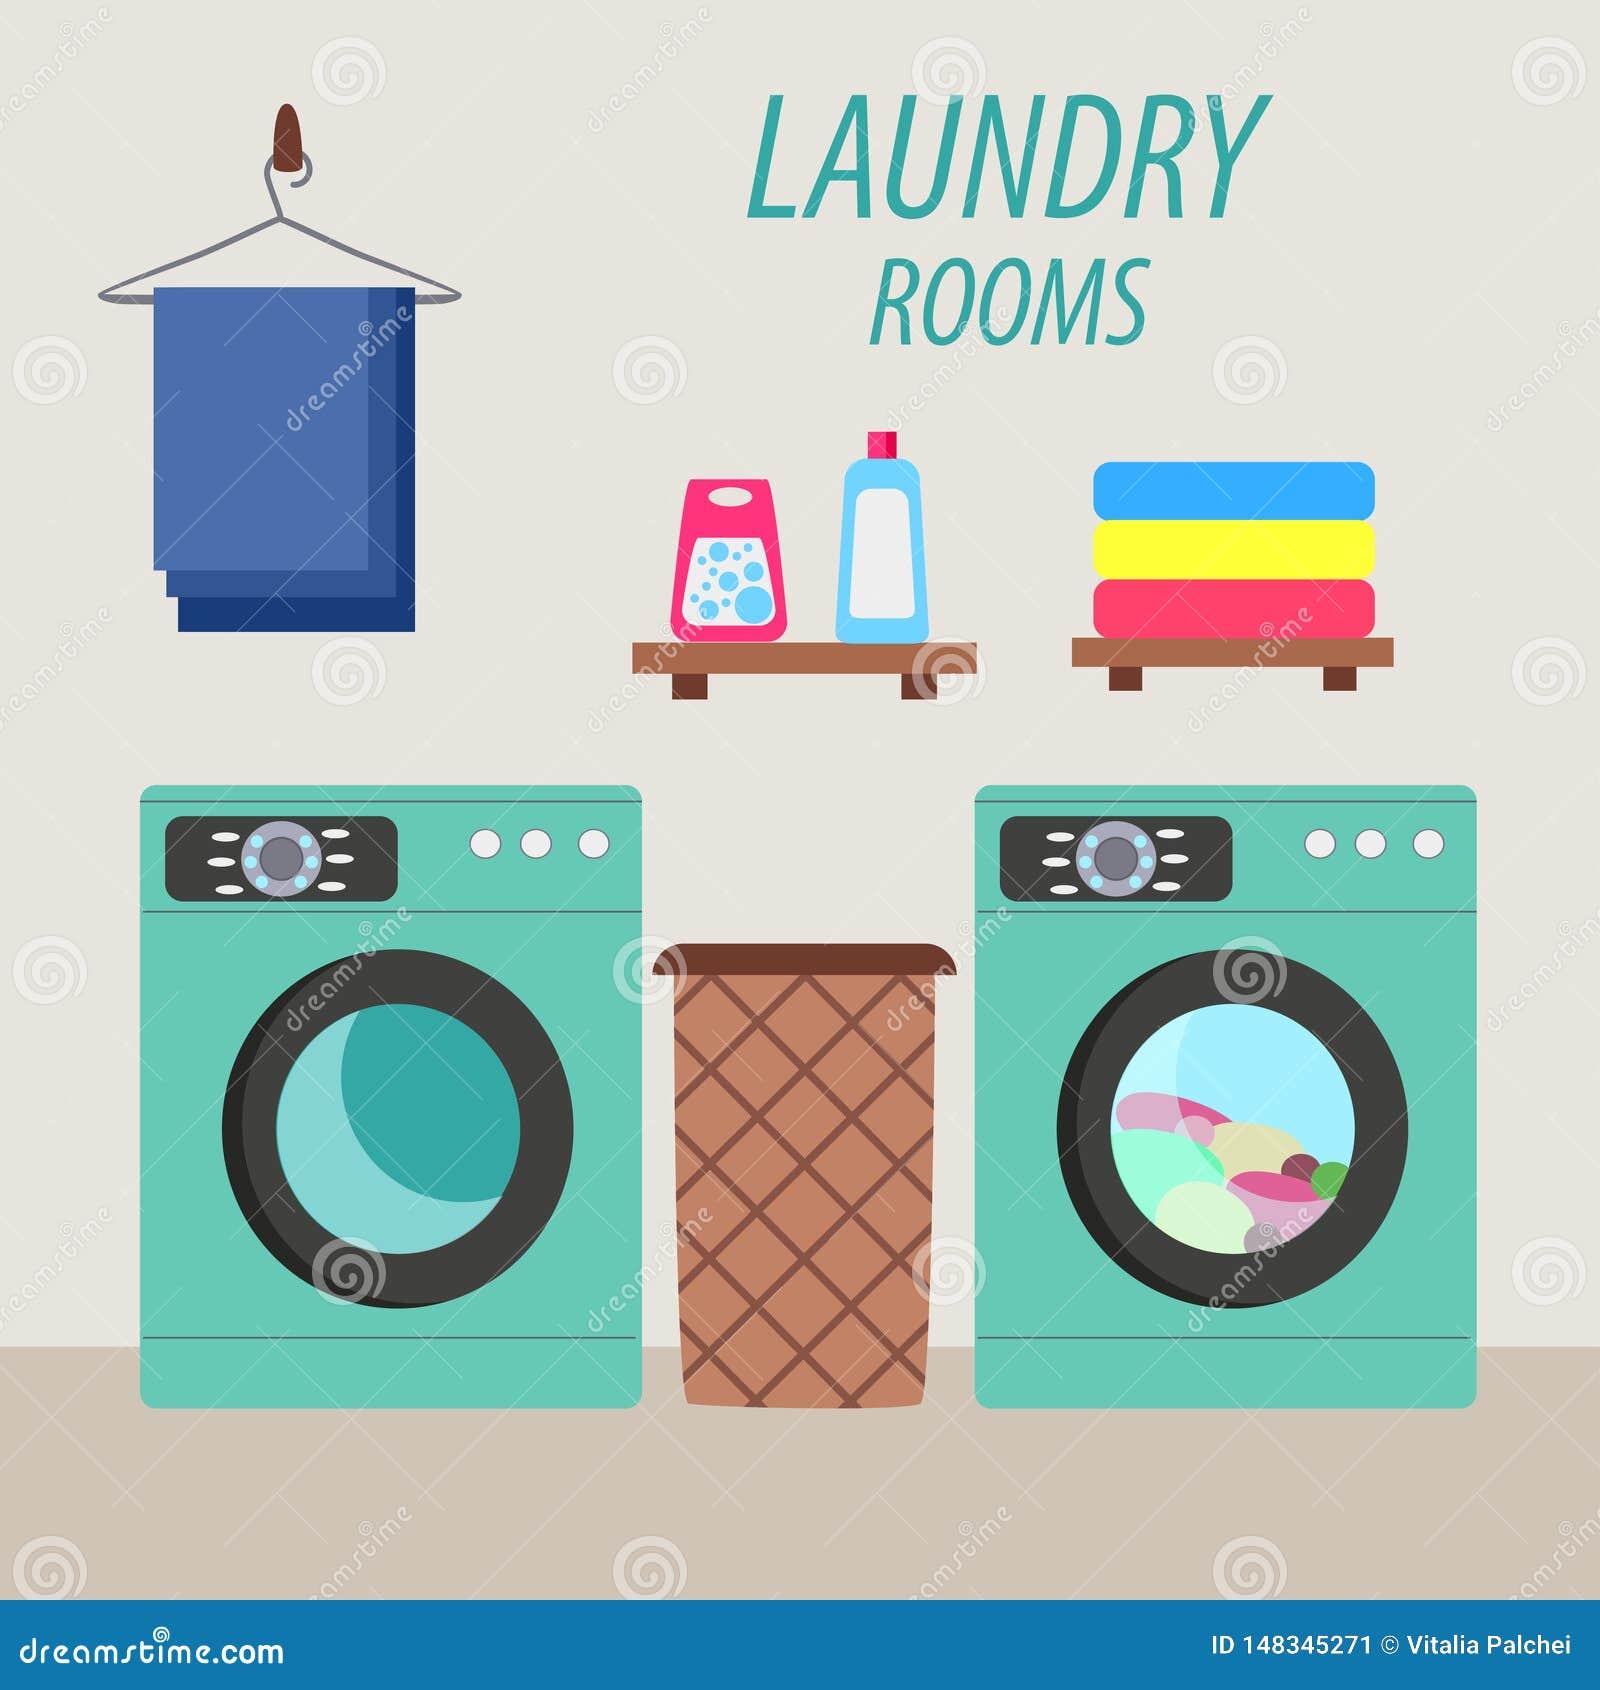 Laundry room with washing machine and laundry basket